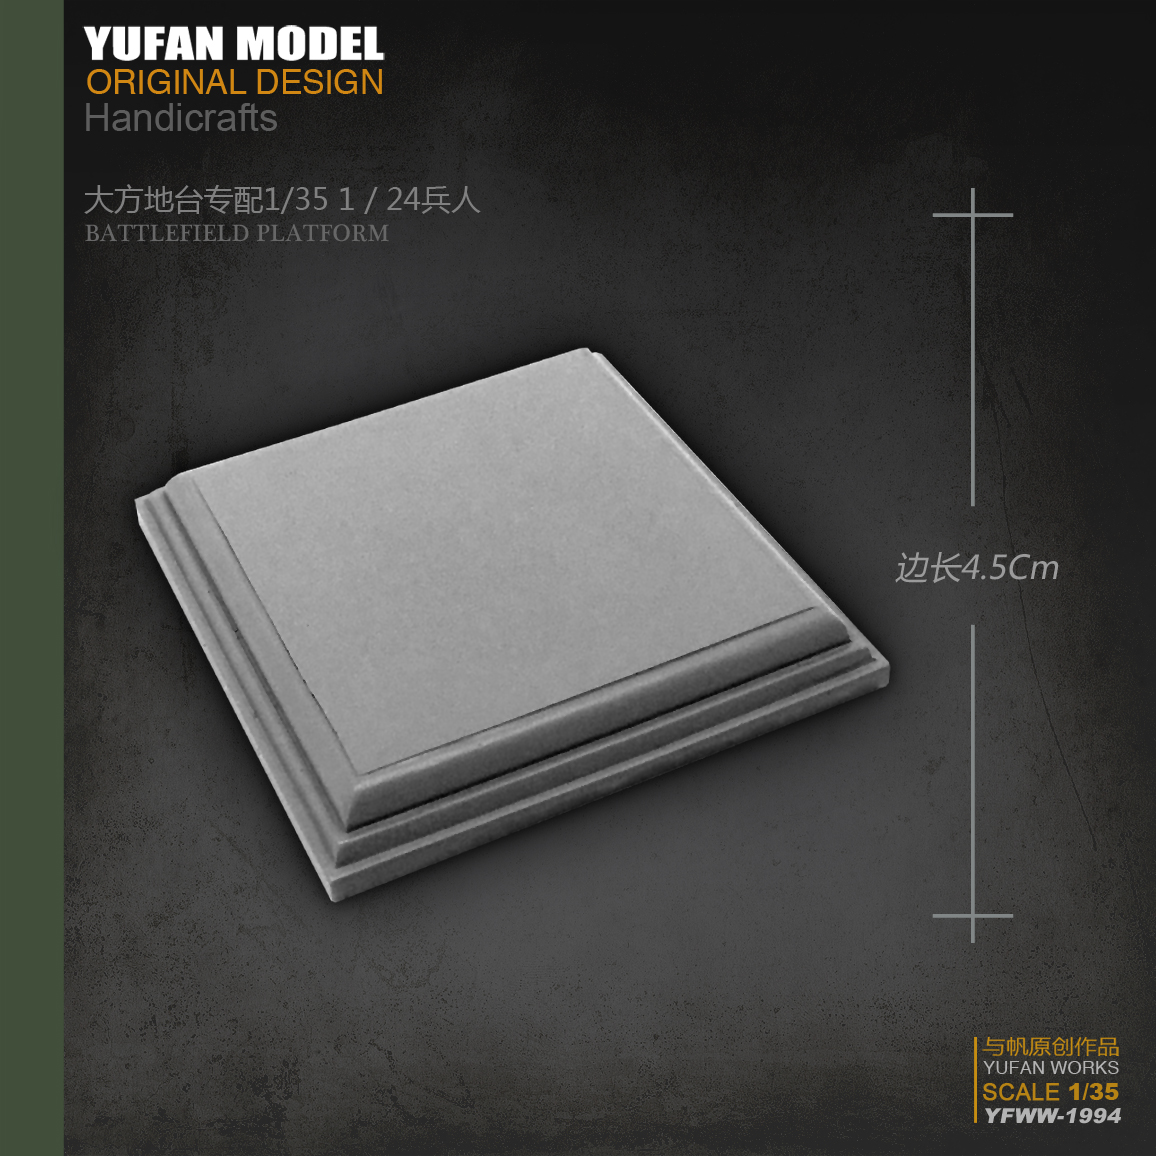 Yufan Model  Resin Platform Of 4.5cm Resin Soldier Yfww-1994